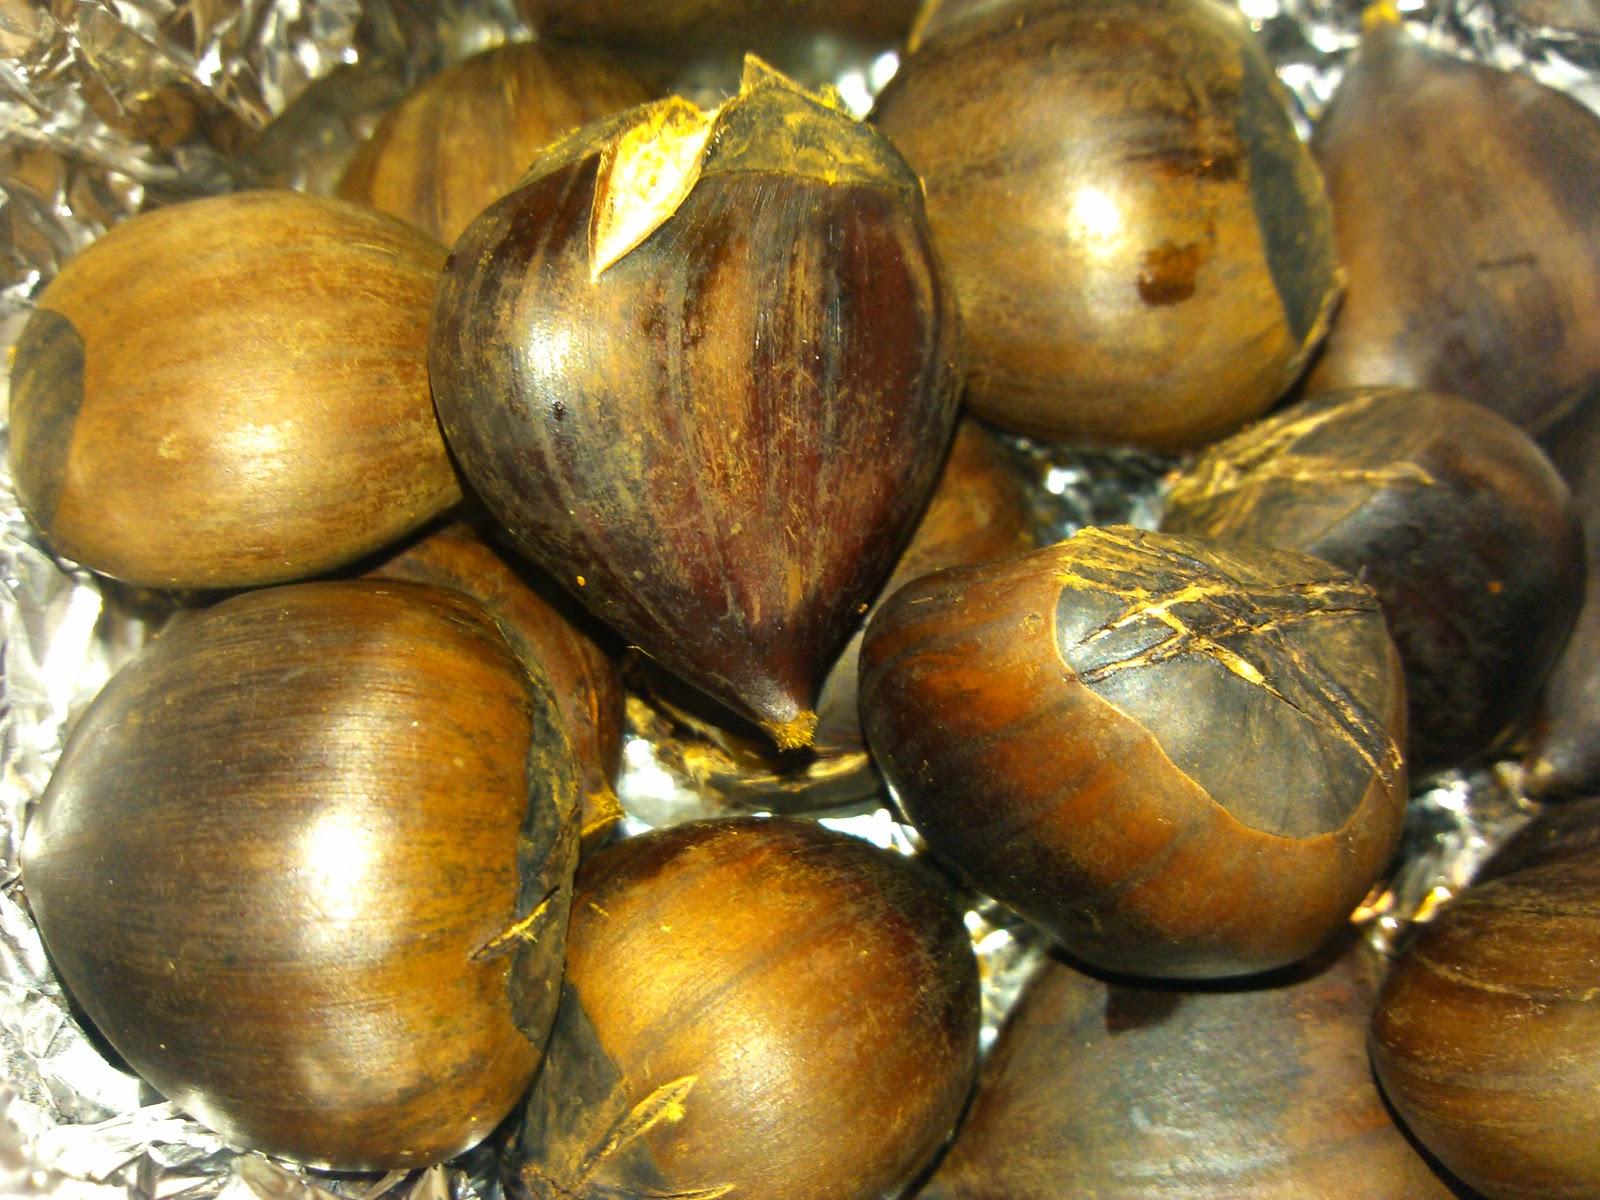 Indianfoodbazaar: Roasted Masala Chestnuts(Vegan)